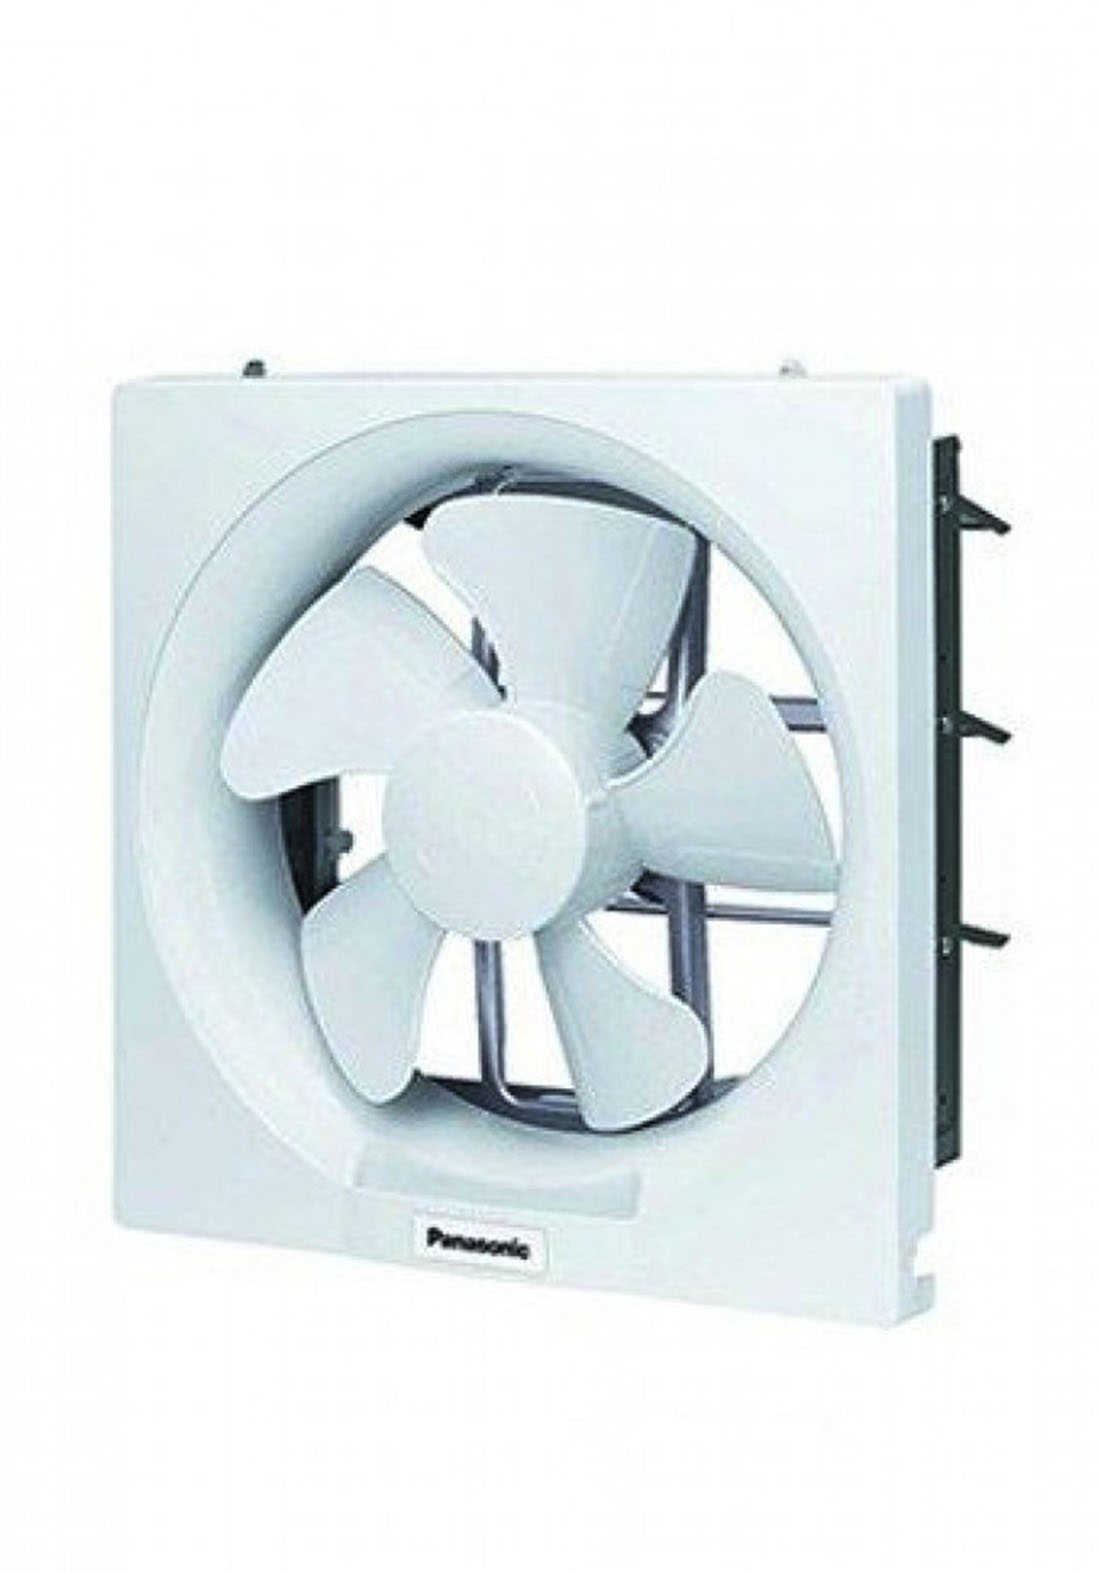 Panasonic FV-20AU9TNAH Ventilating Fans 20 cm ساحبة هوائية